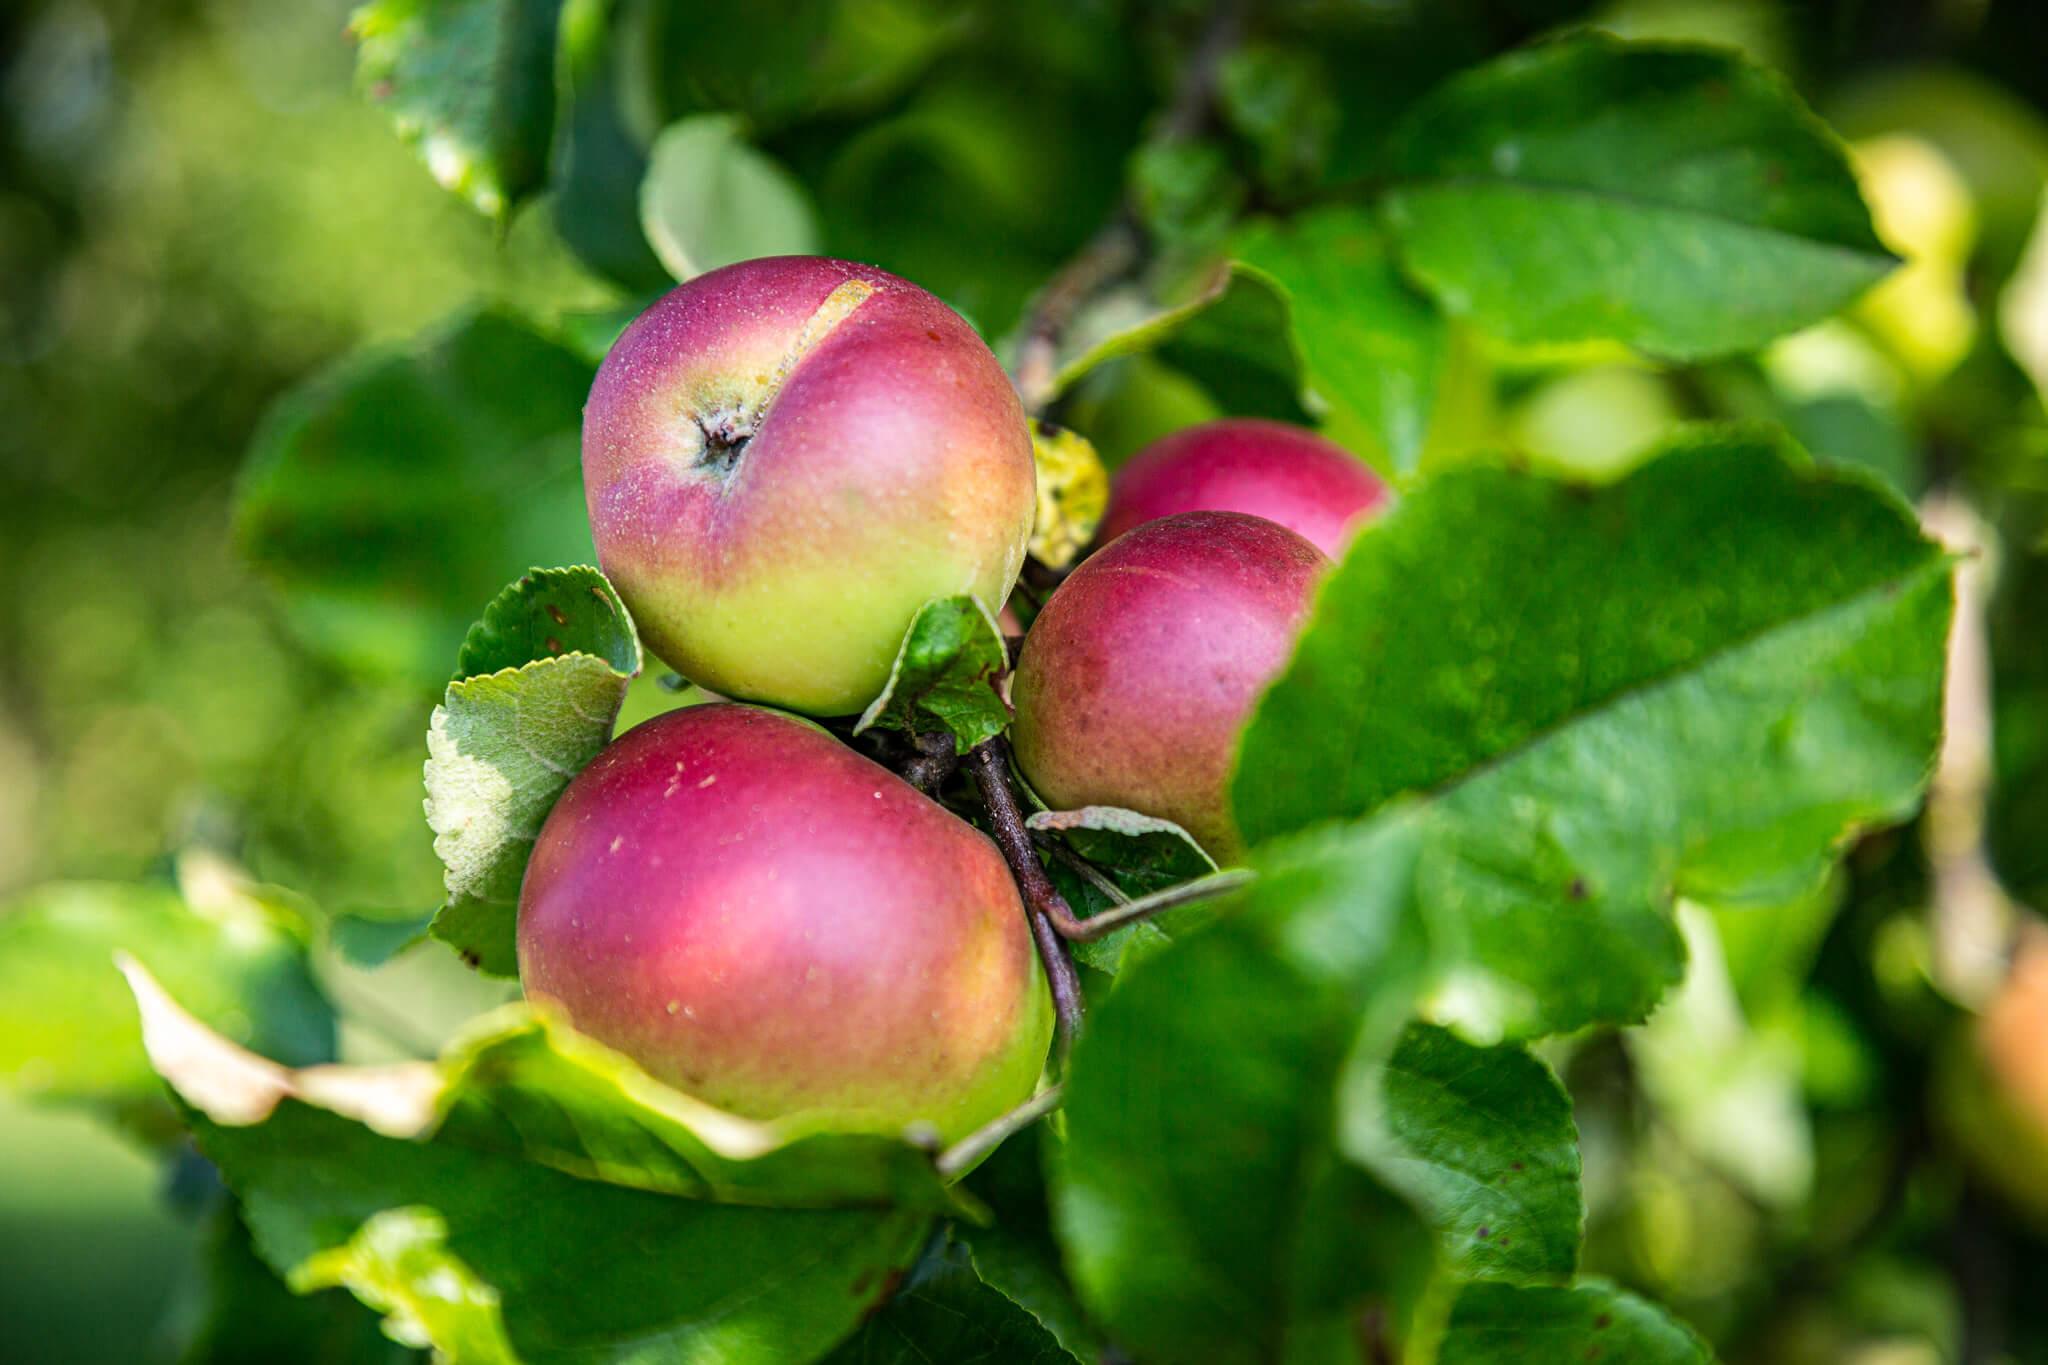 Hofkellerei Lackner Walding Obst Anbau Bio